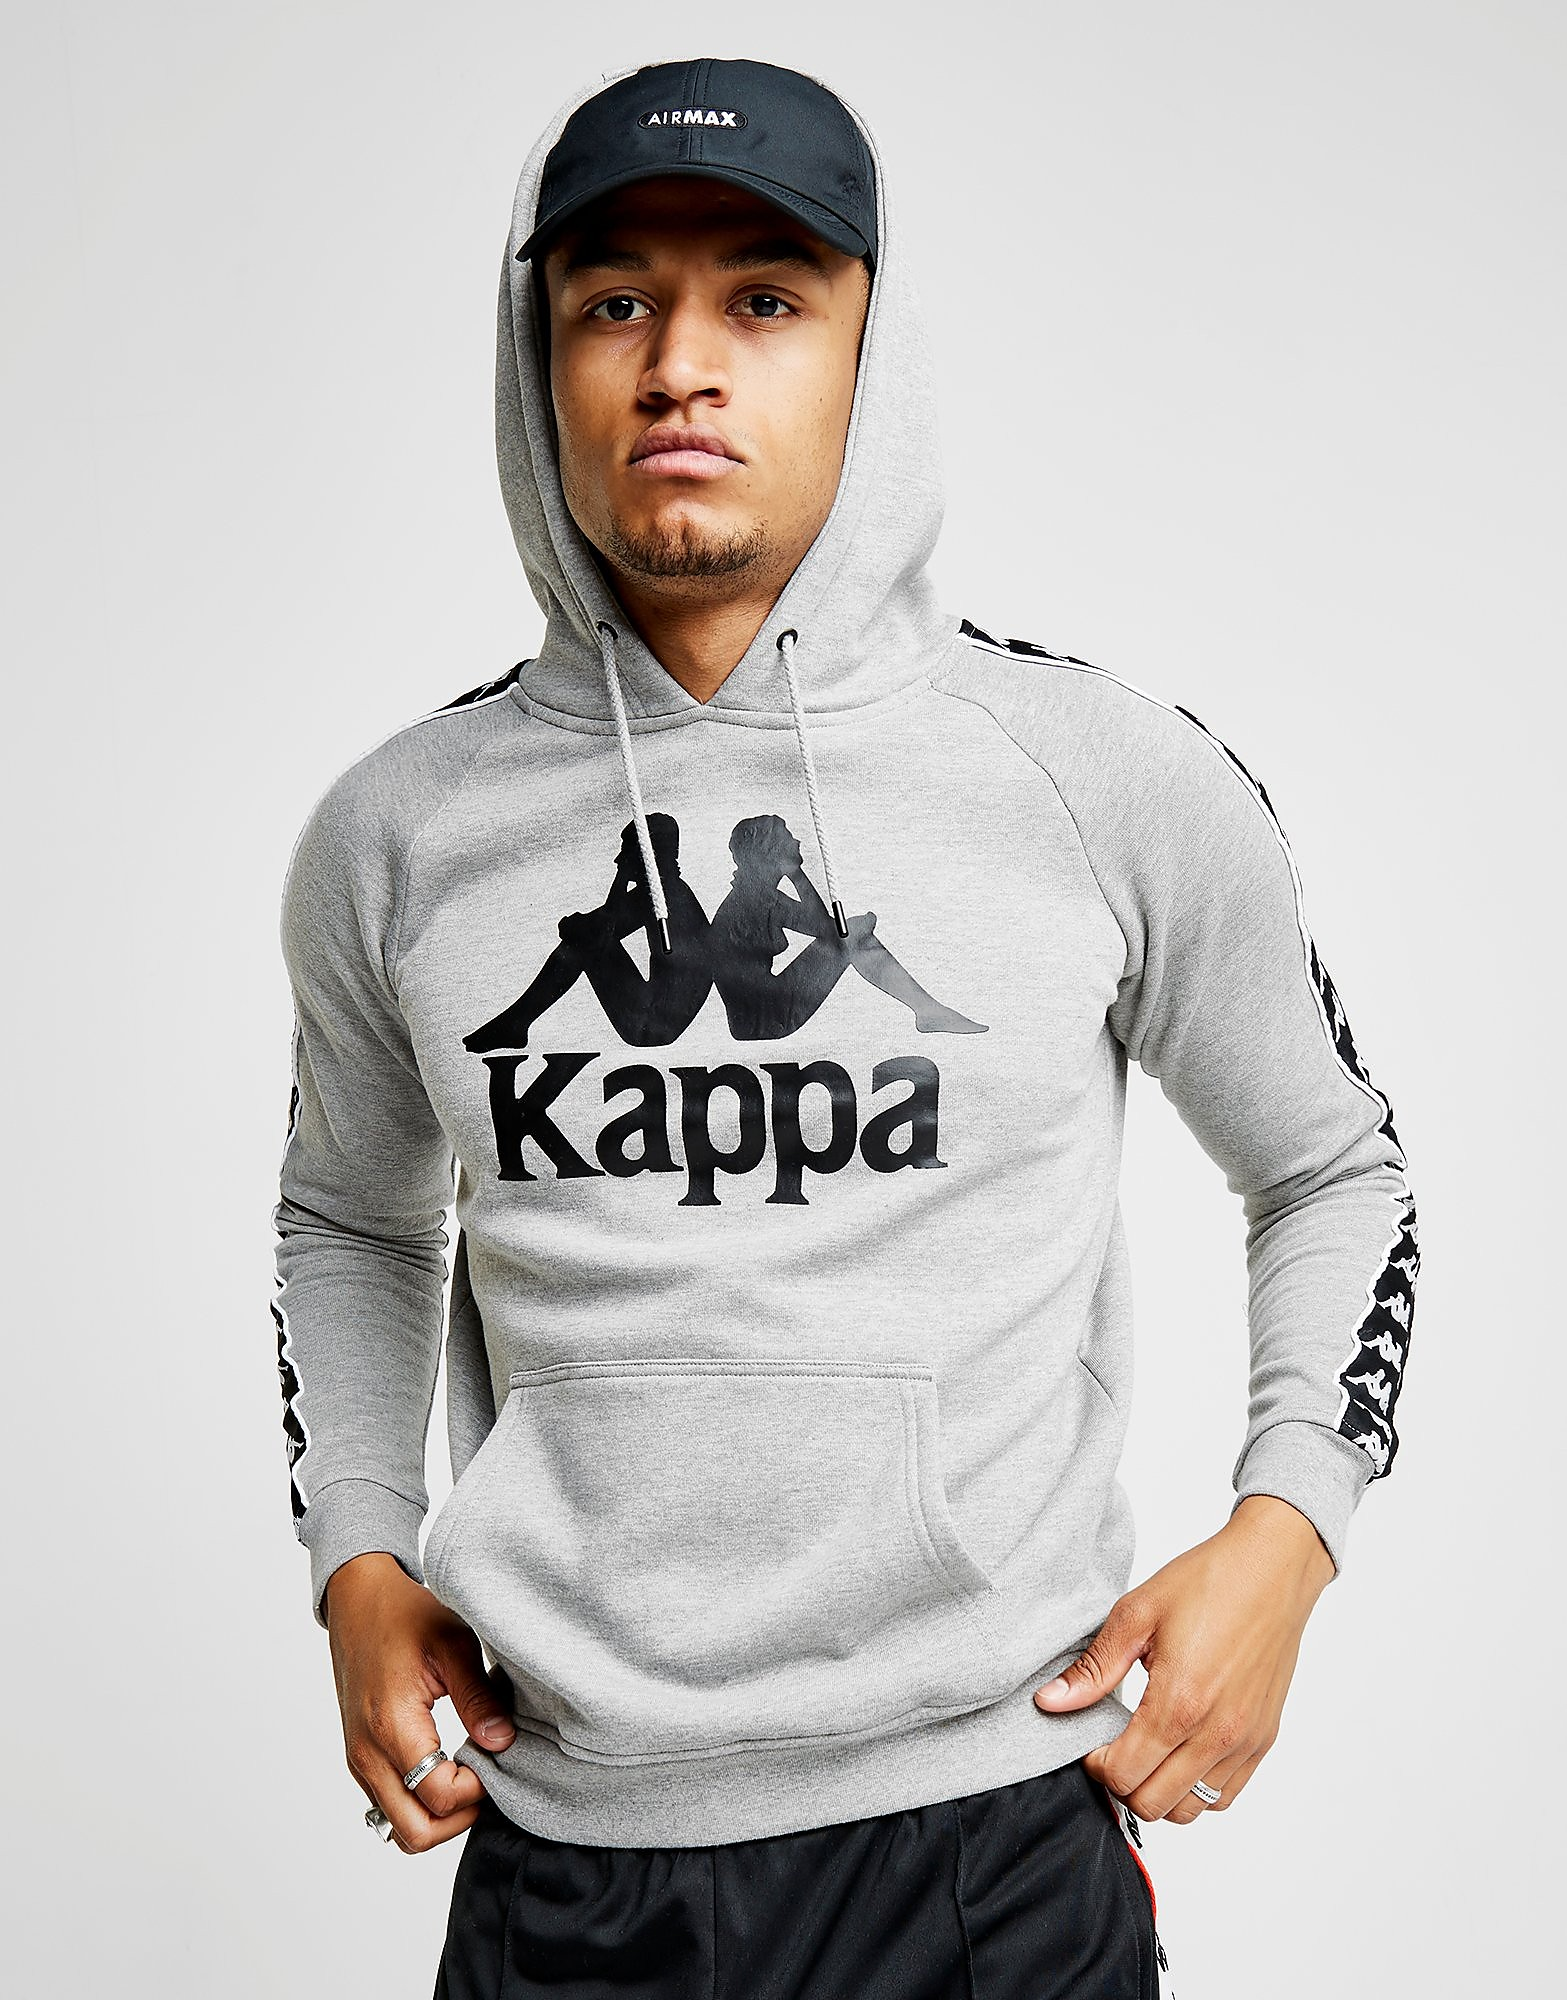 Kappa Authentic Hurtado Tape Hoodie